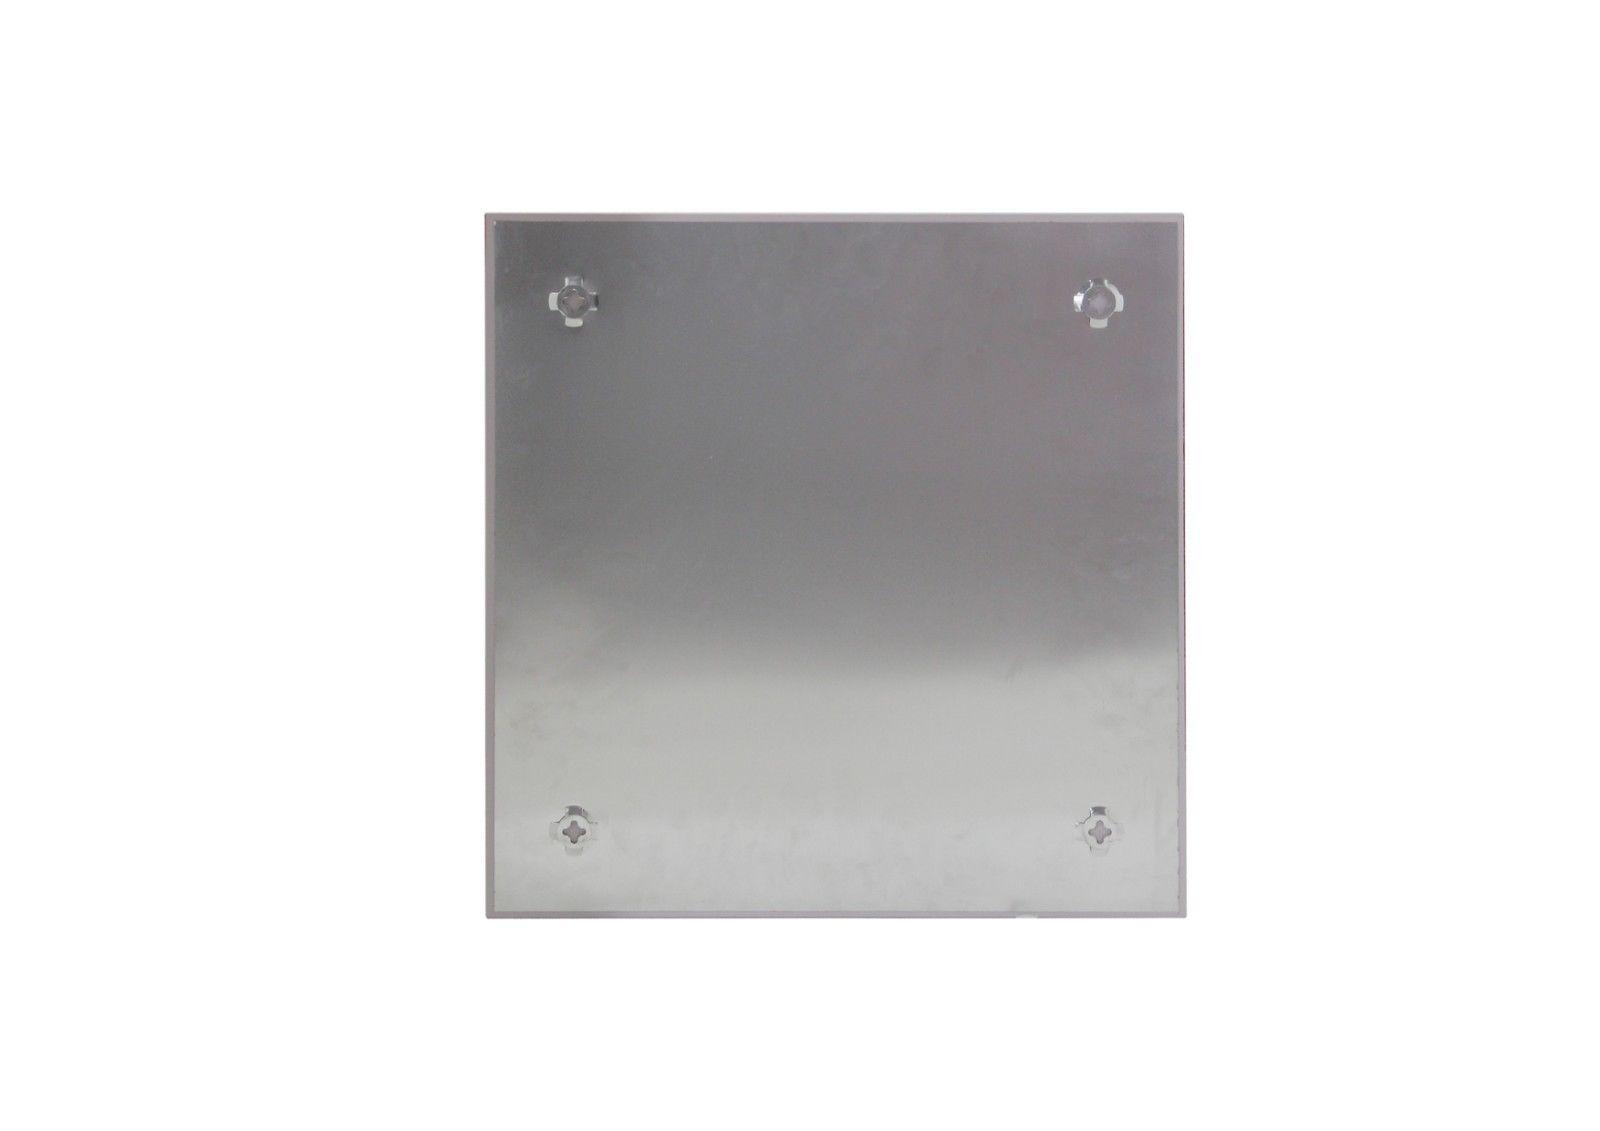 Memoboard-Glas-Magnettafel-Glastafel-Glasboard-Whiteboard-Wandtafel-Magnet-Board